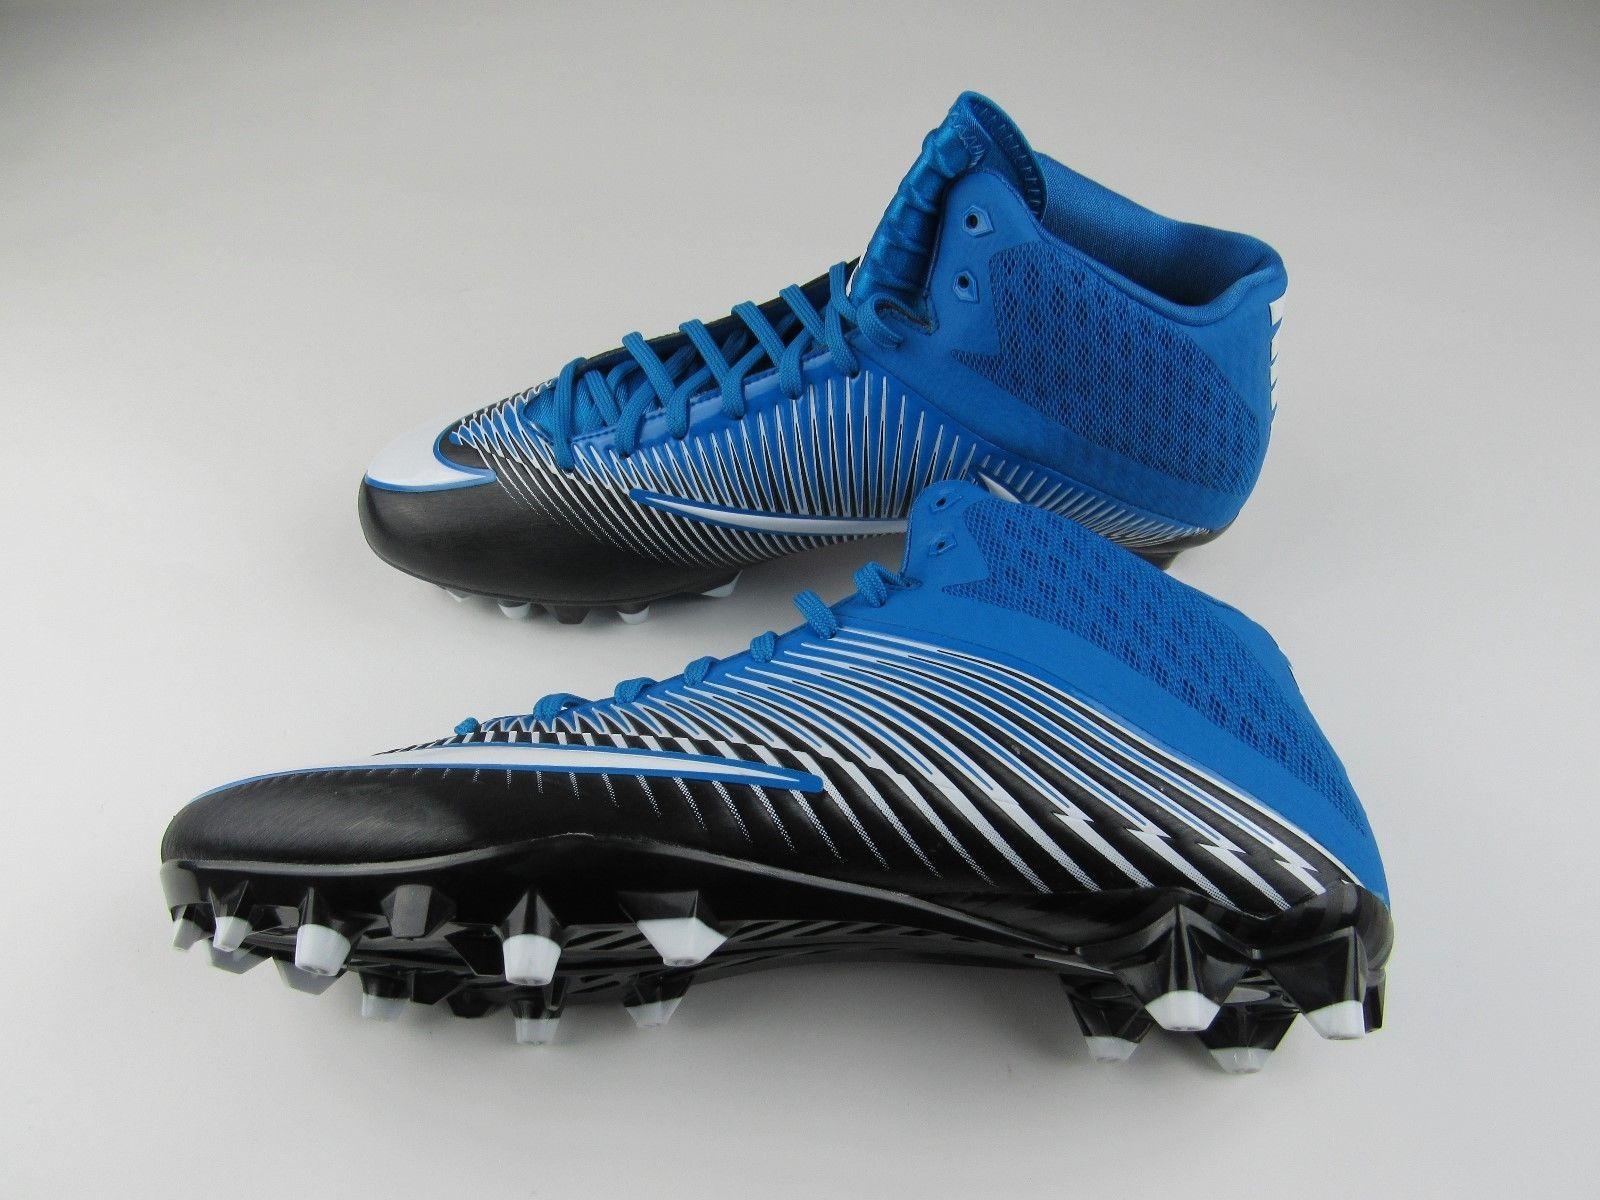 uk availability 61512 9cd54 NEW Mens Nike Vapor Speed Football Cleats Size 14 846443-405 Blue Black  White